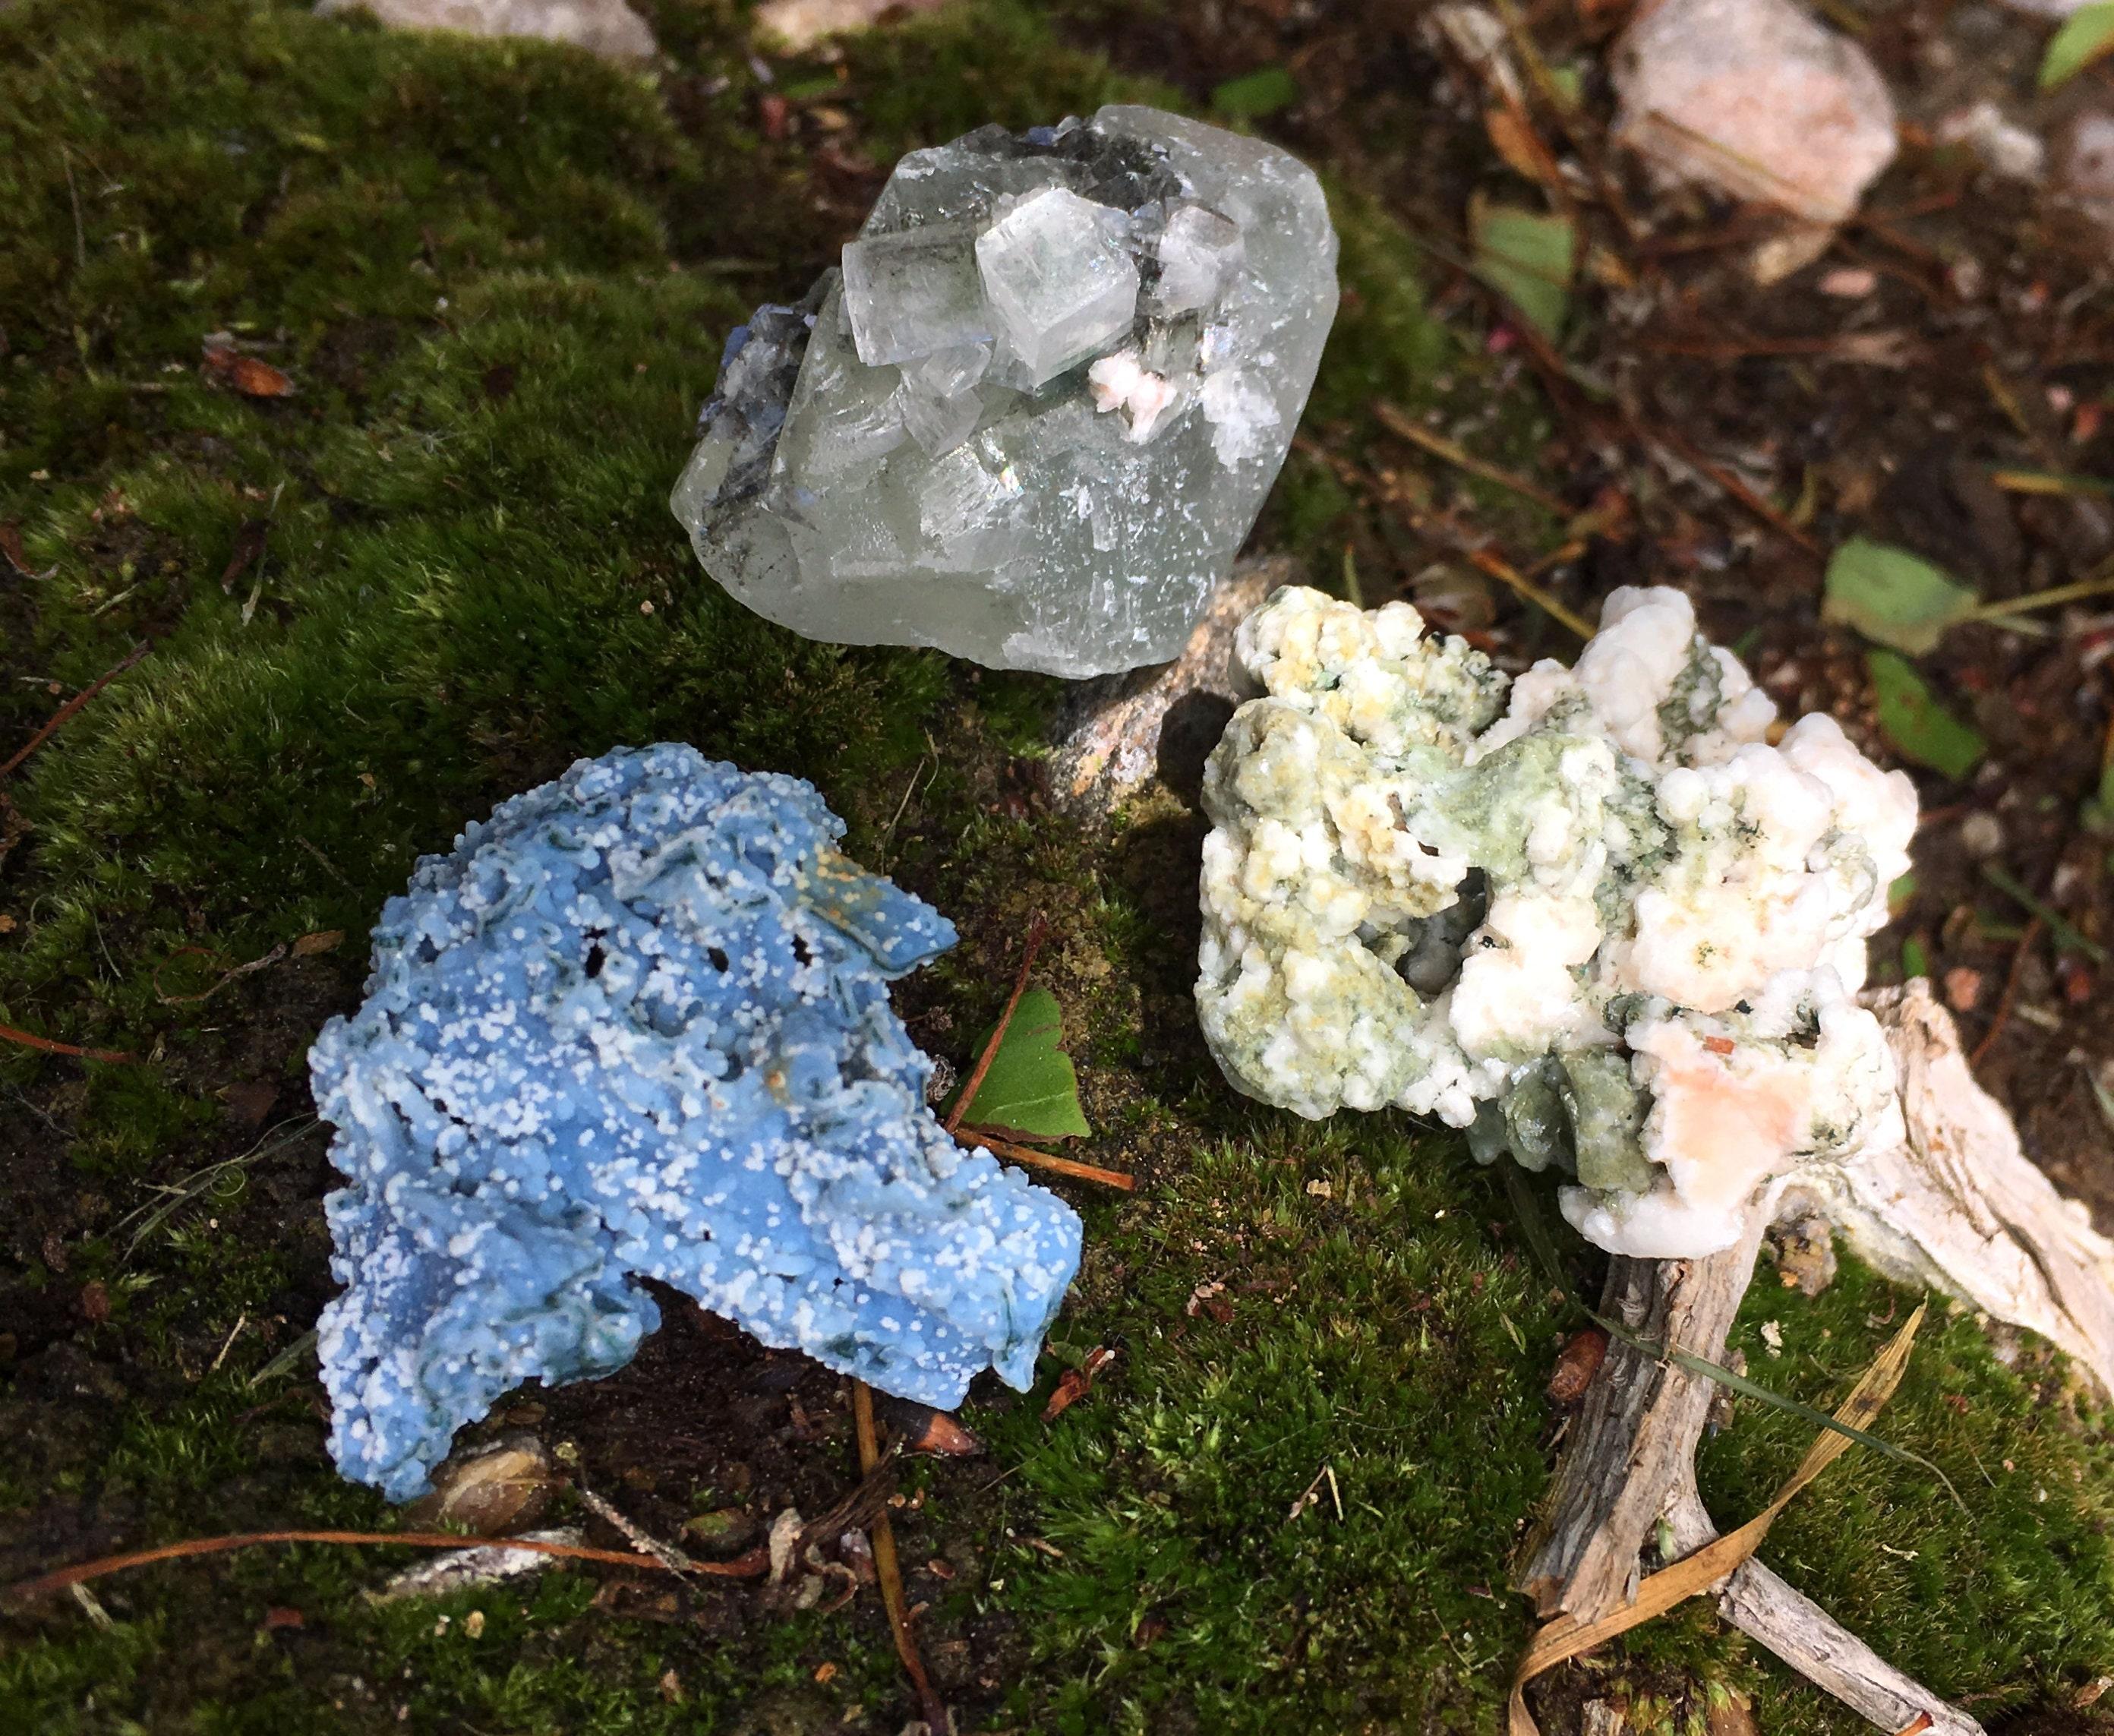 Zeolite, Apophyllite, Stilbite, Heulandite, Deccan Traps